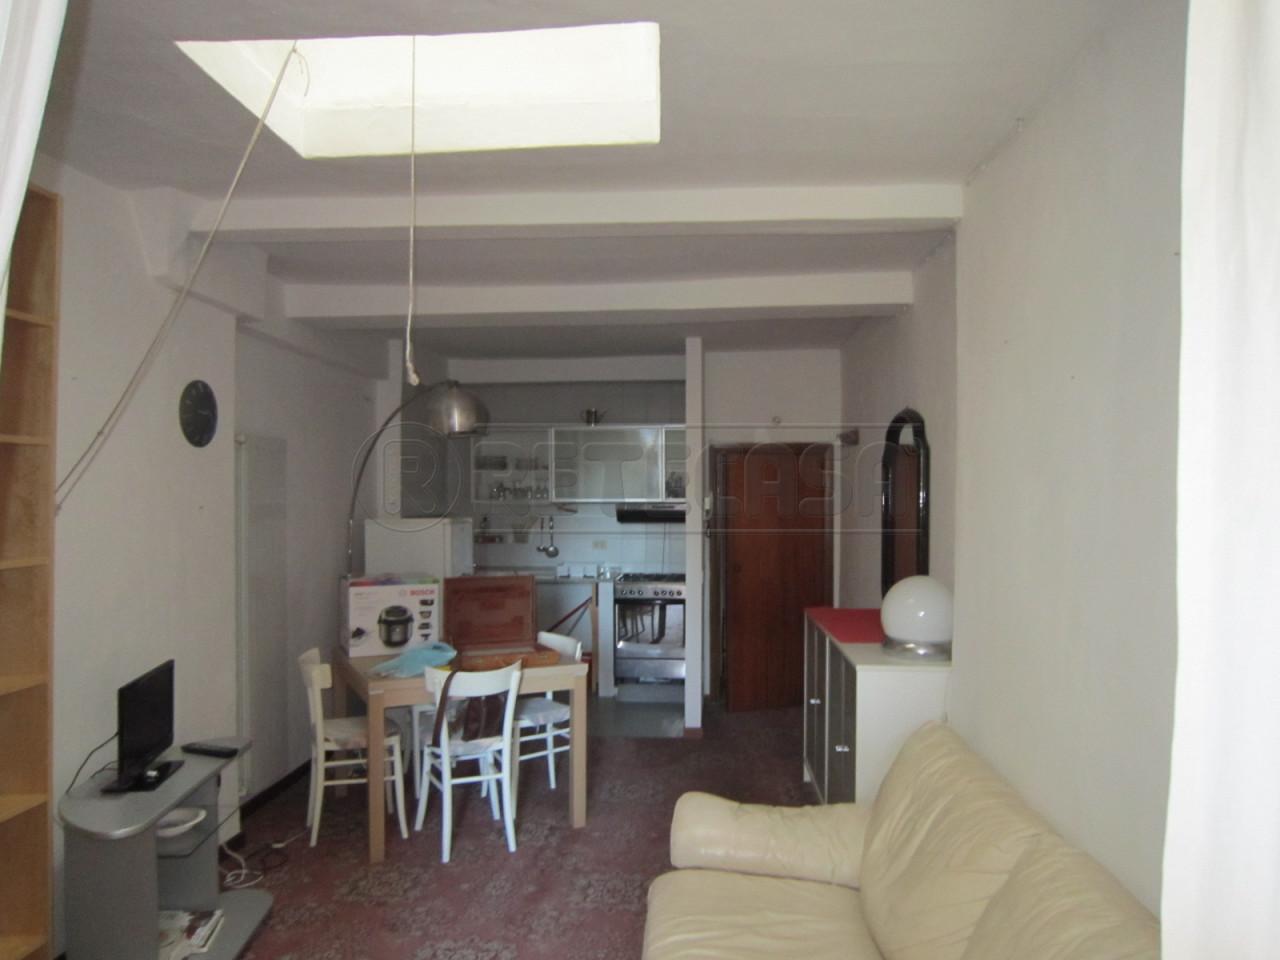 Monolocale - Garconier, 45 Mq, Vendita - Siena